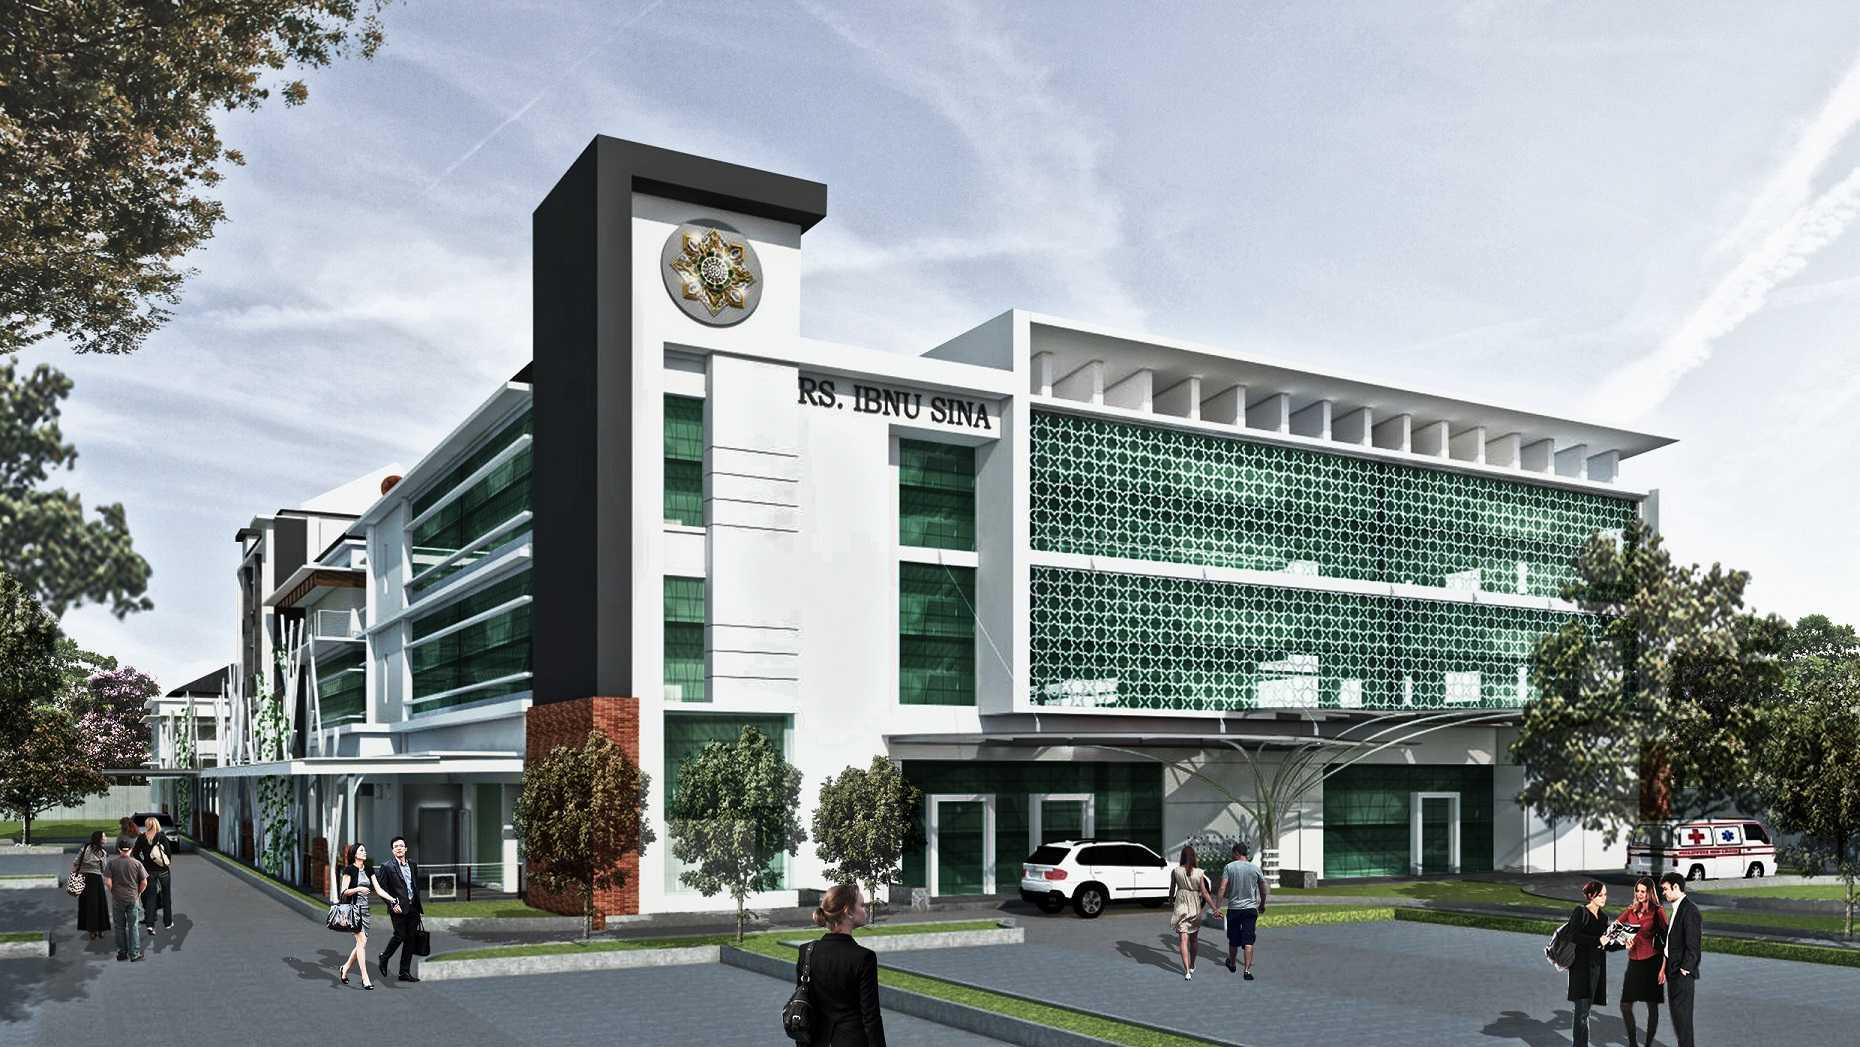 Vastu Cipta Persada Rumah Sakit Ibnu Sina Kabupaten Sragen, Jawa Tengah, Indonesia Kabupaten Sragen, Jawa Tengah, Indonesia Front View Modern  39456